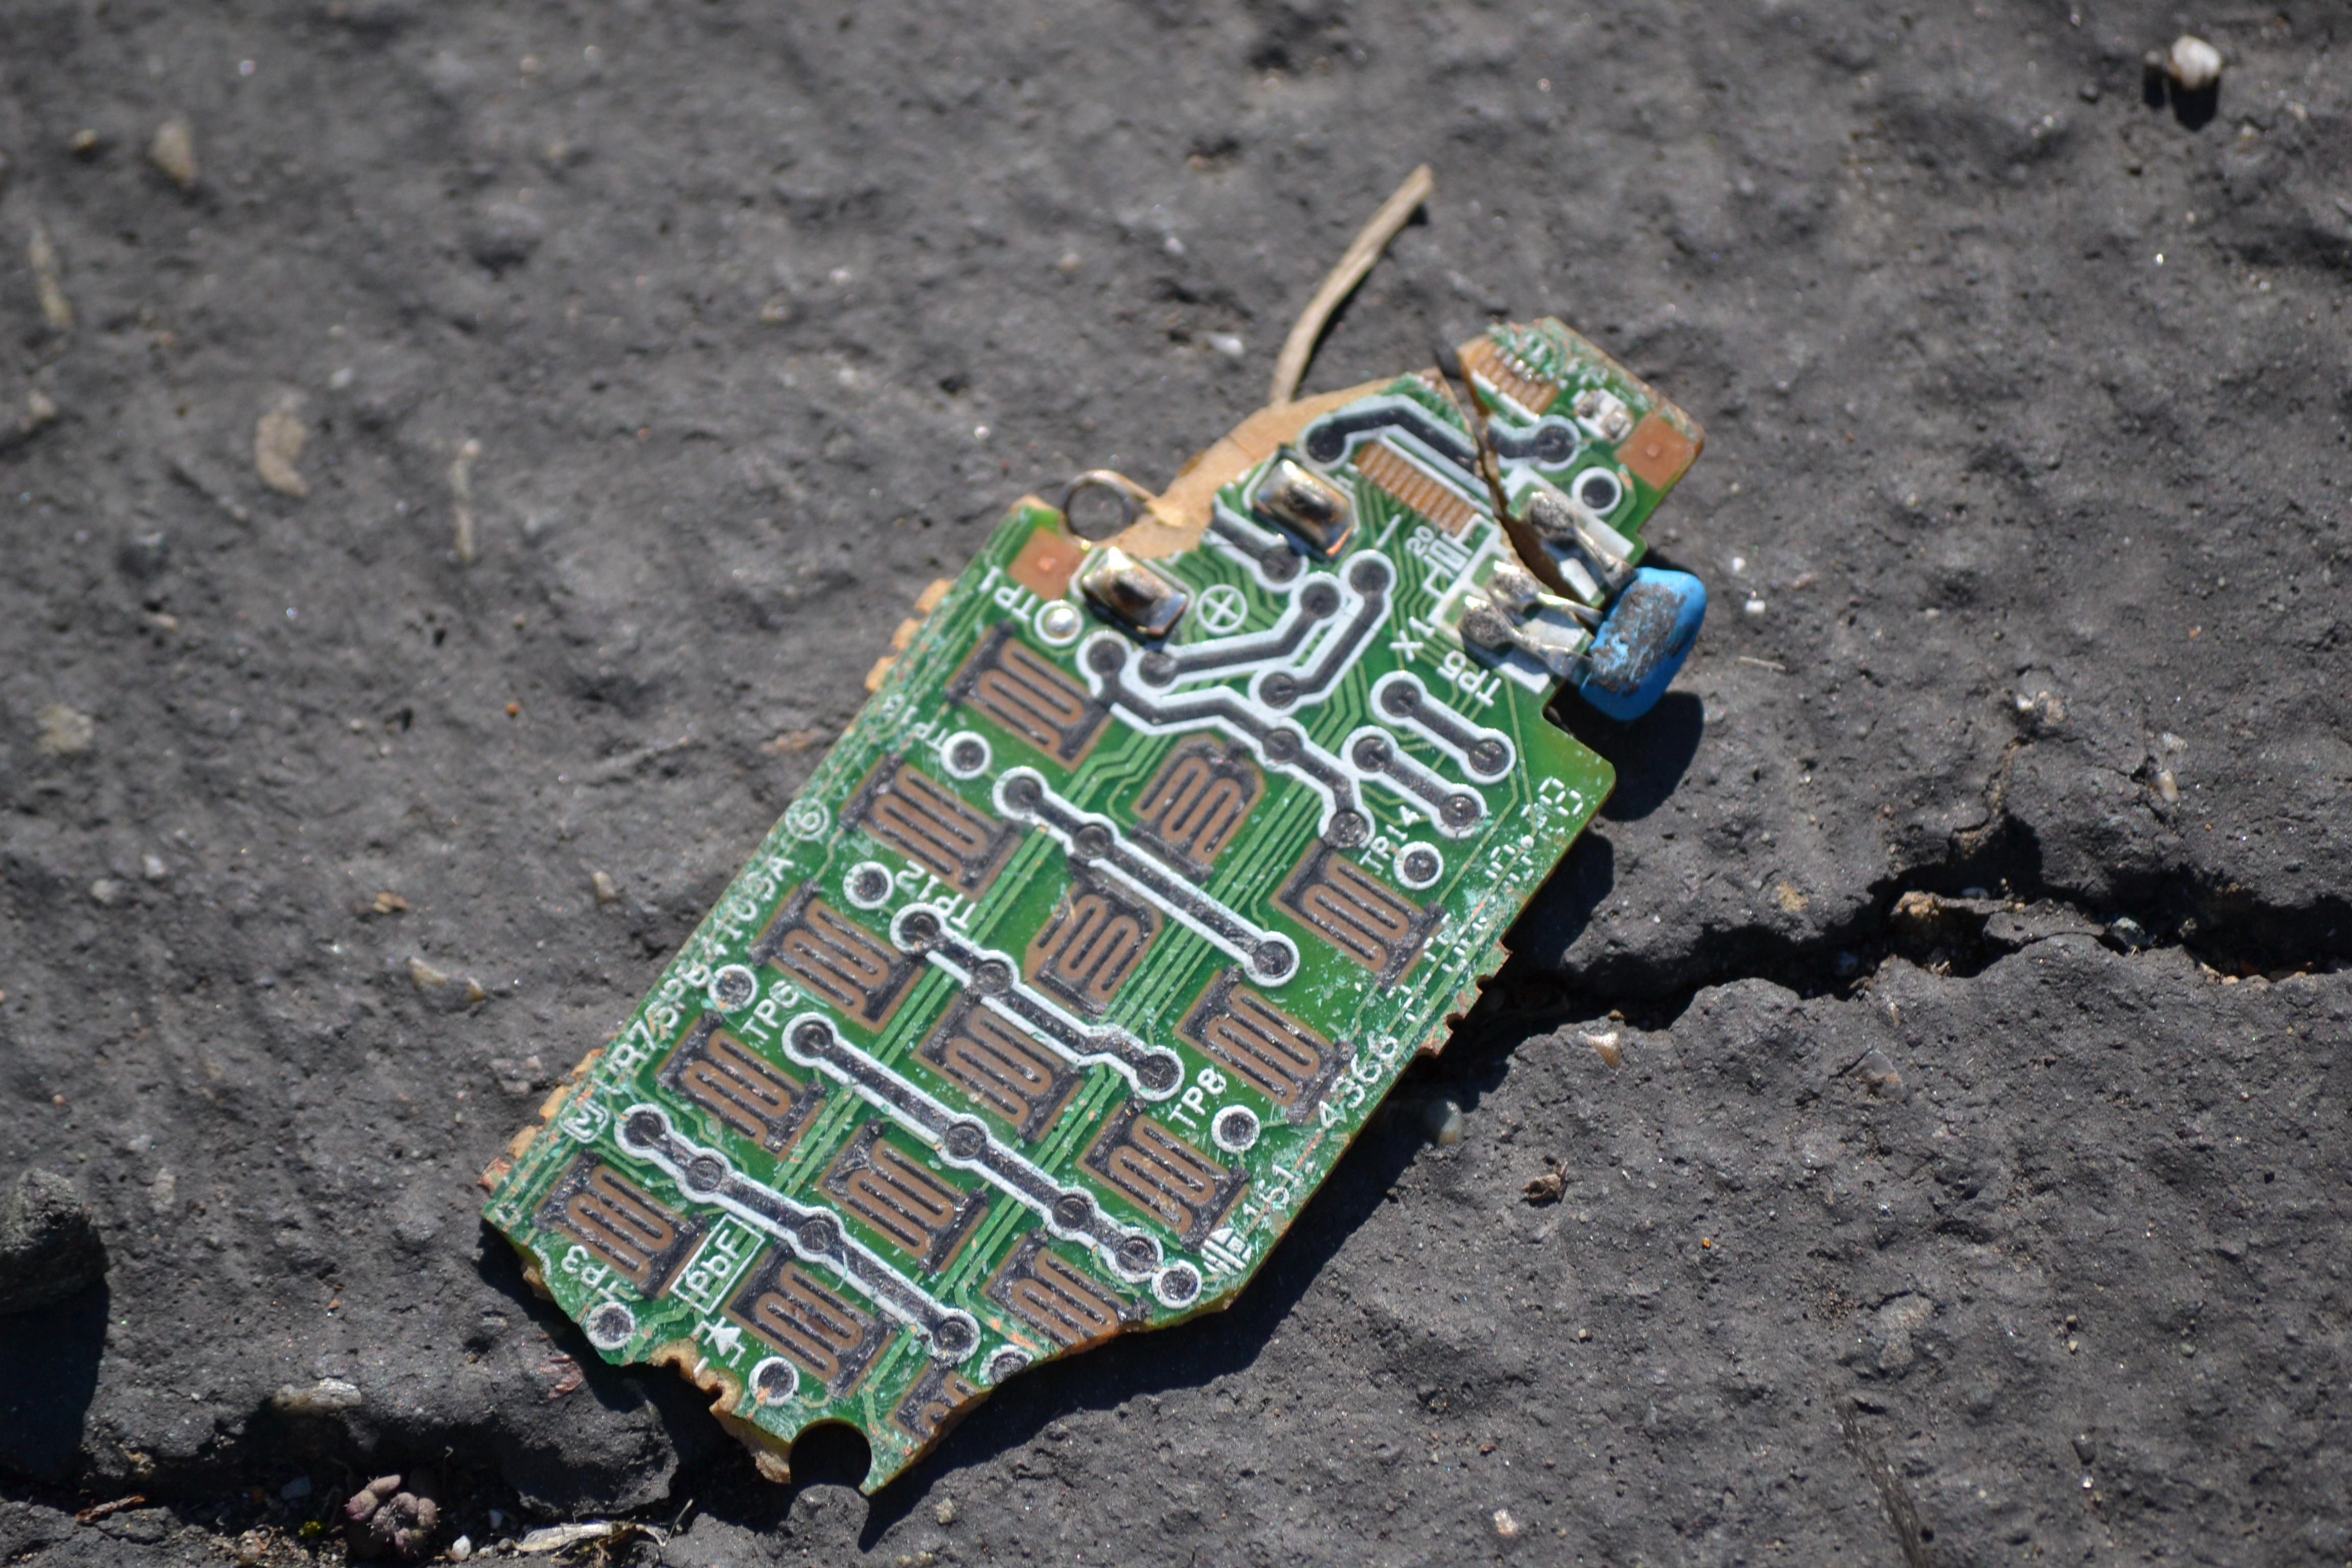 fragmentofdiscardedcircuitboard.